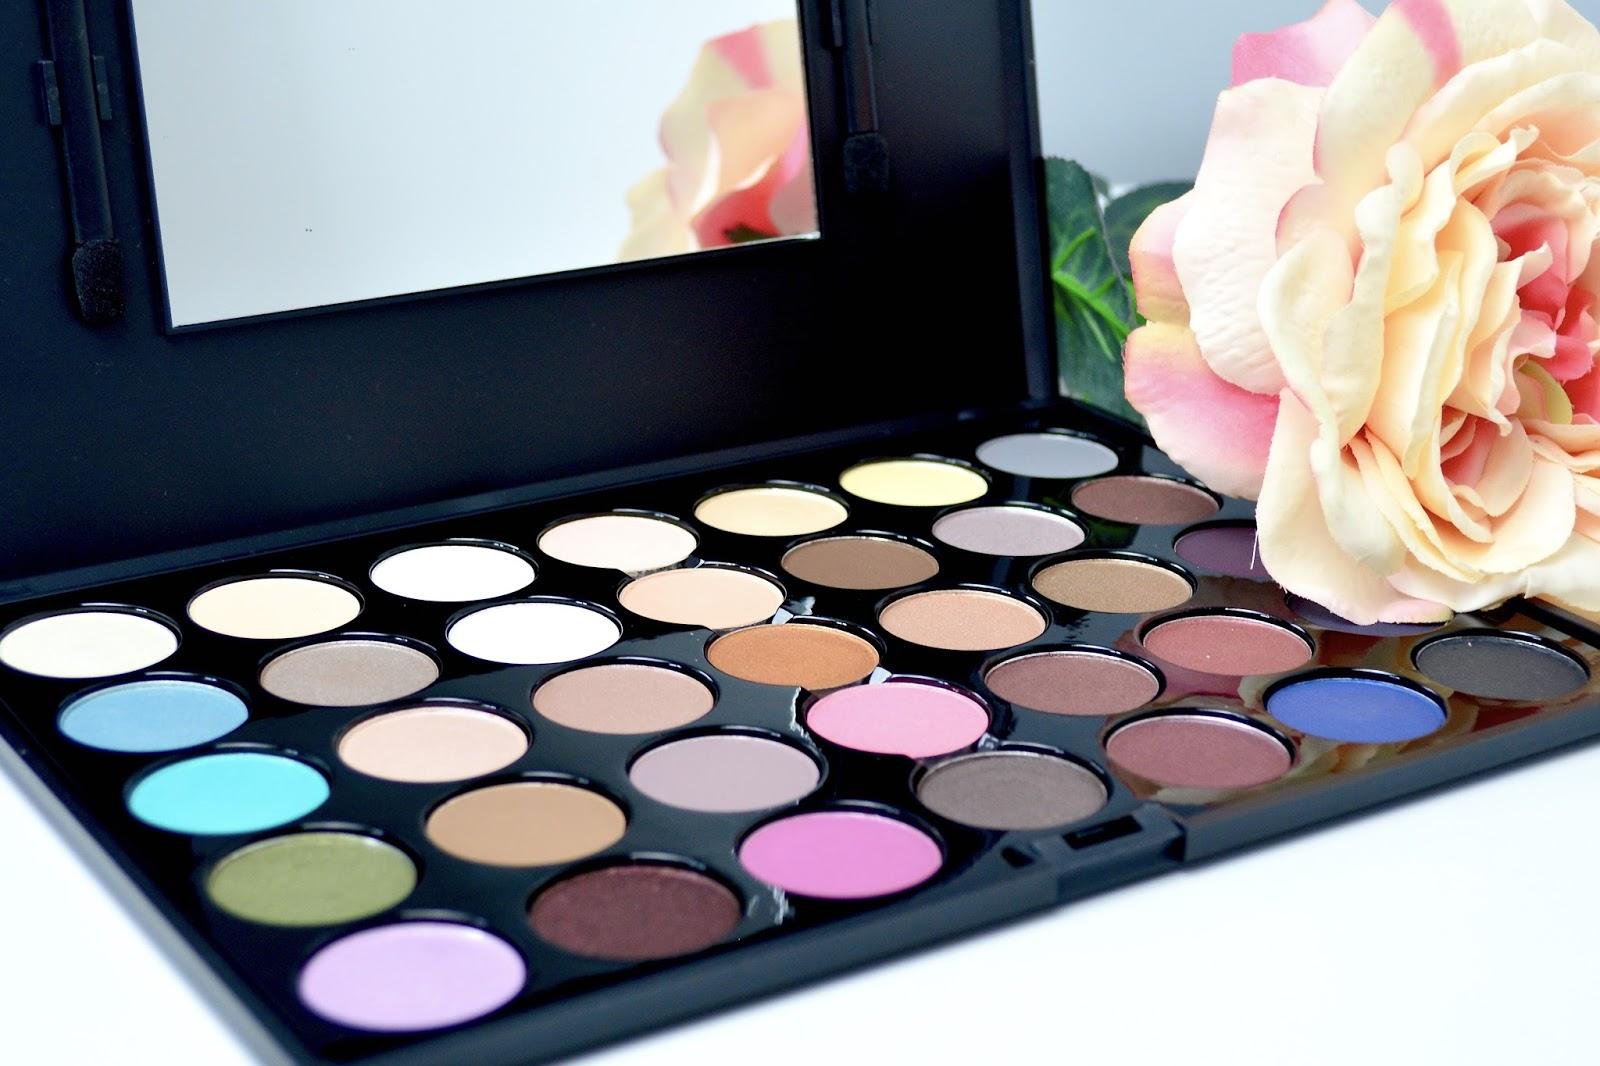 Crown Brush, Crown Brush Eyeshadow Palette, Palette, Eyeshadow, Shadow, Back To Basics Makeup, Back To Basics Palette